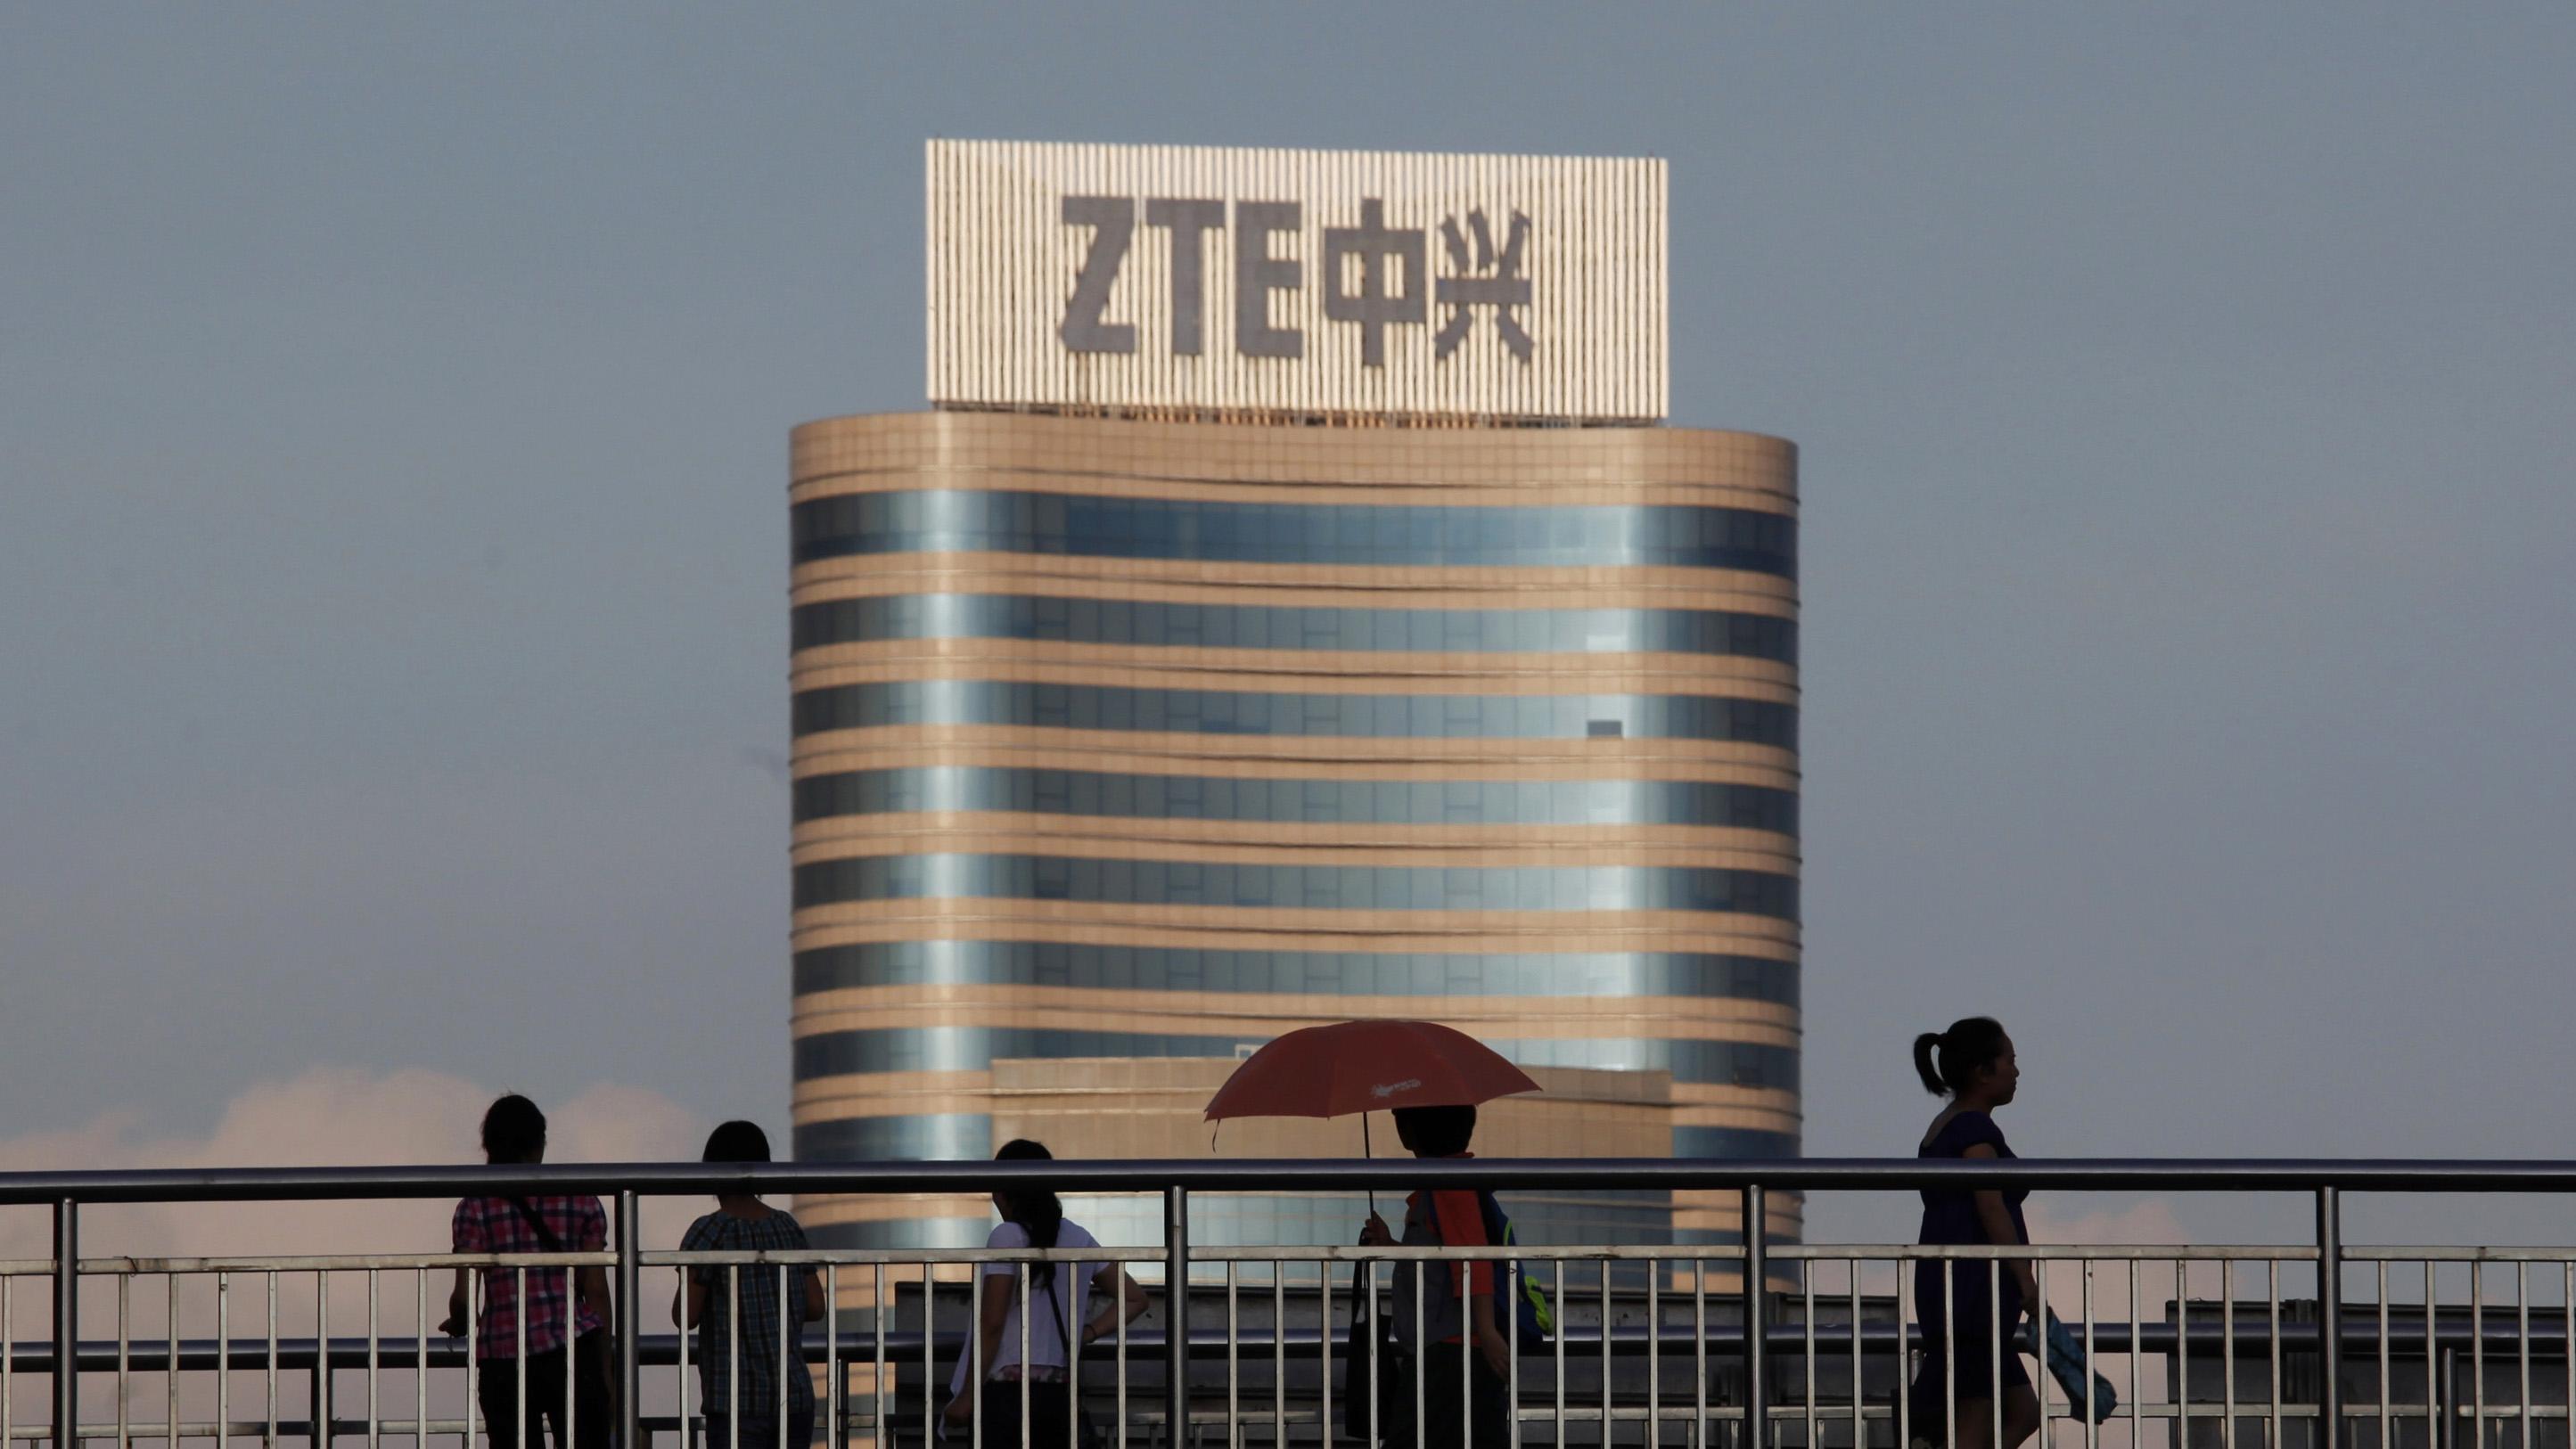 Passers by walk along a footbridge in front of the ZTE building in Nanshan Hi-Tech Industrial Estate in Shenzhen